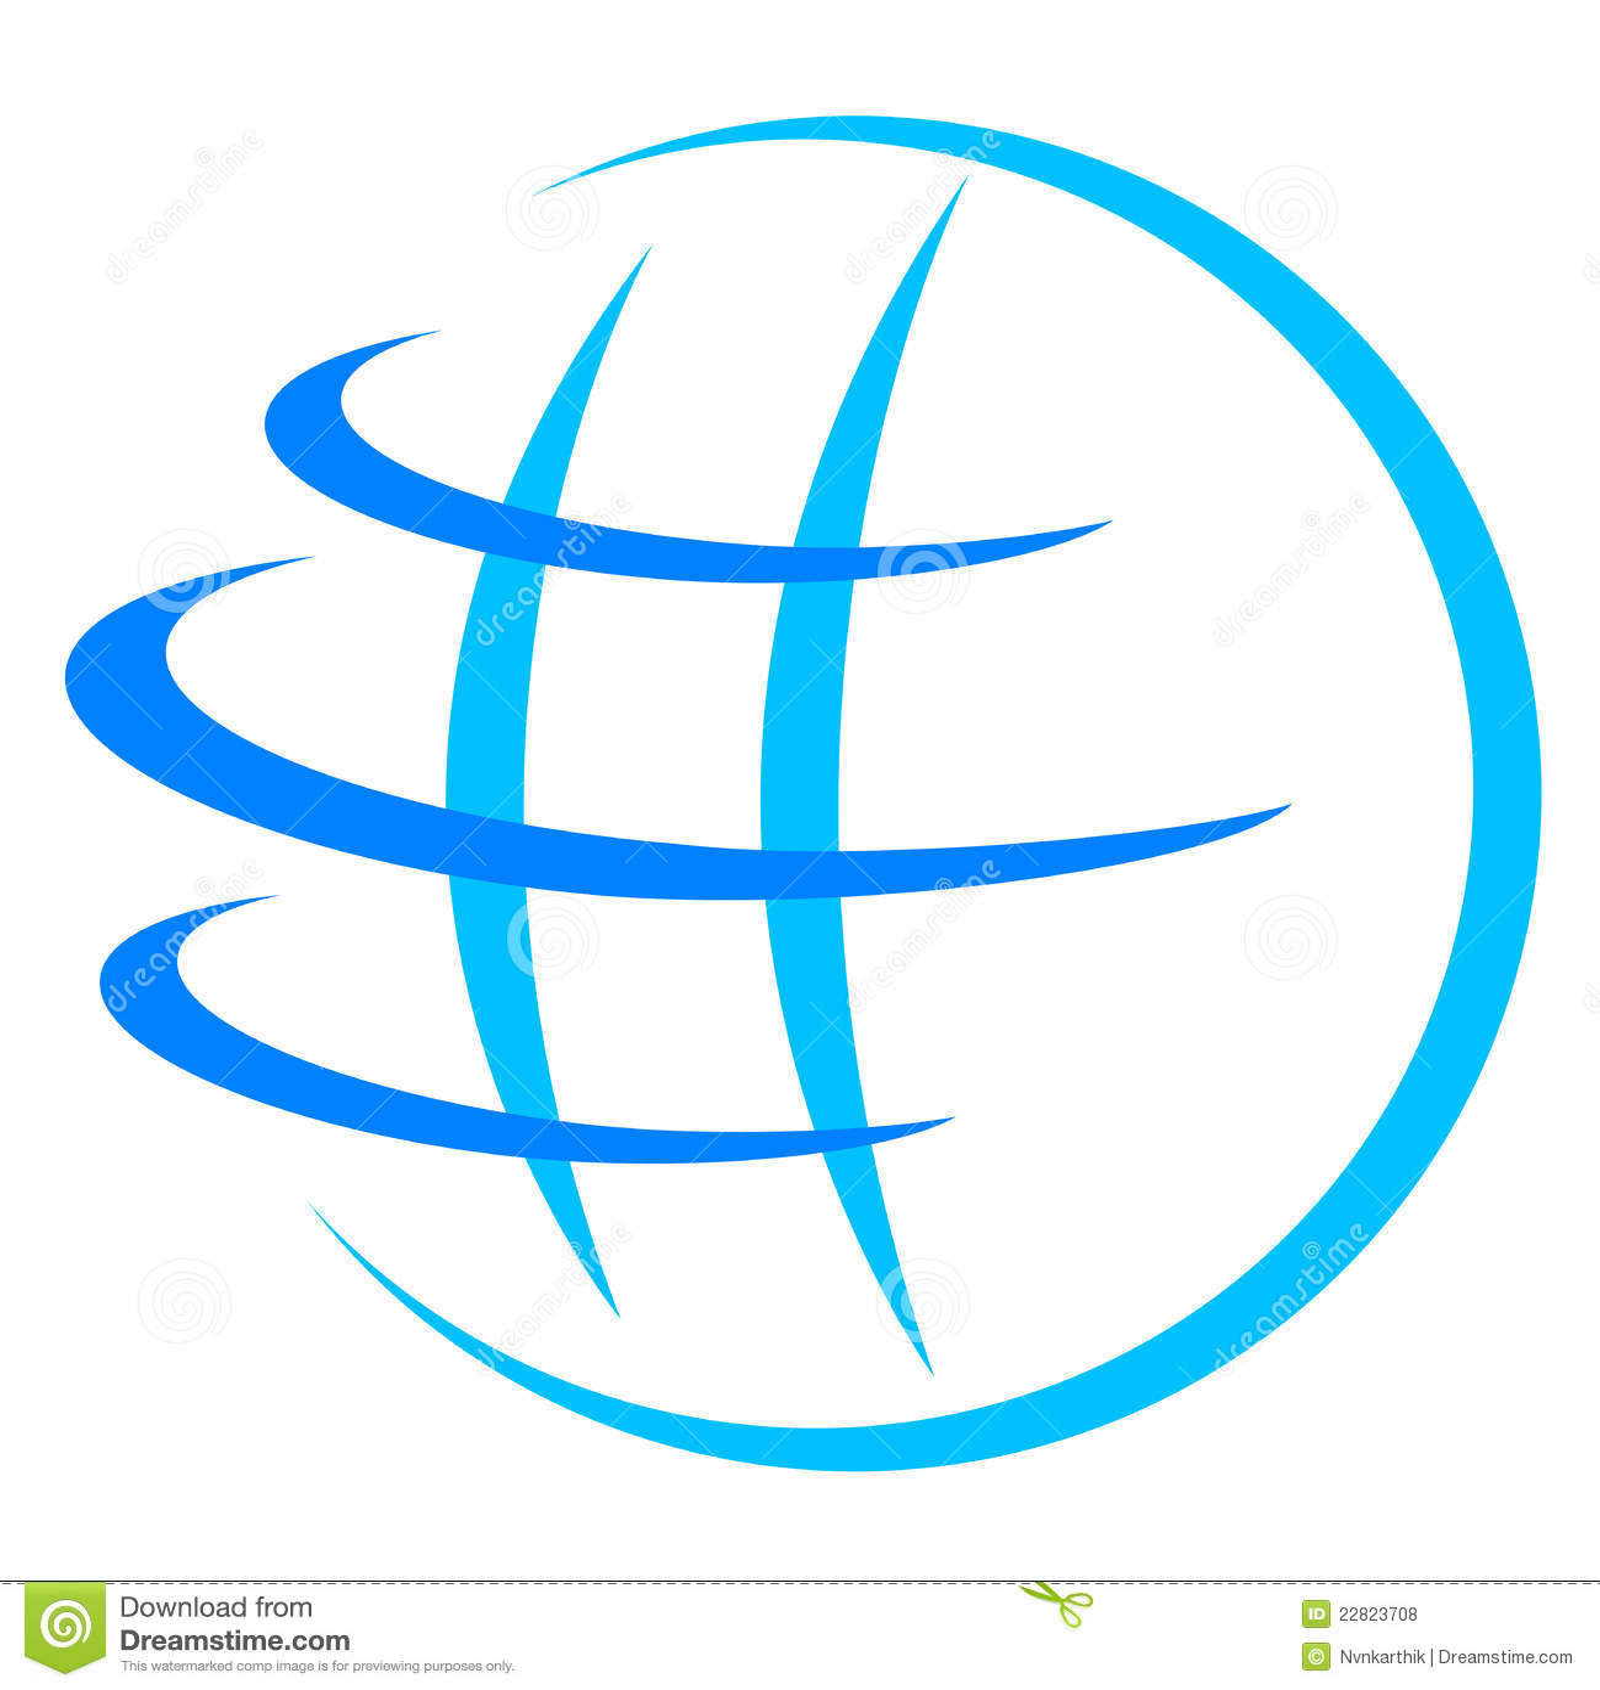 Globe Logo Royalty Free Stock Photos Image 22823708